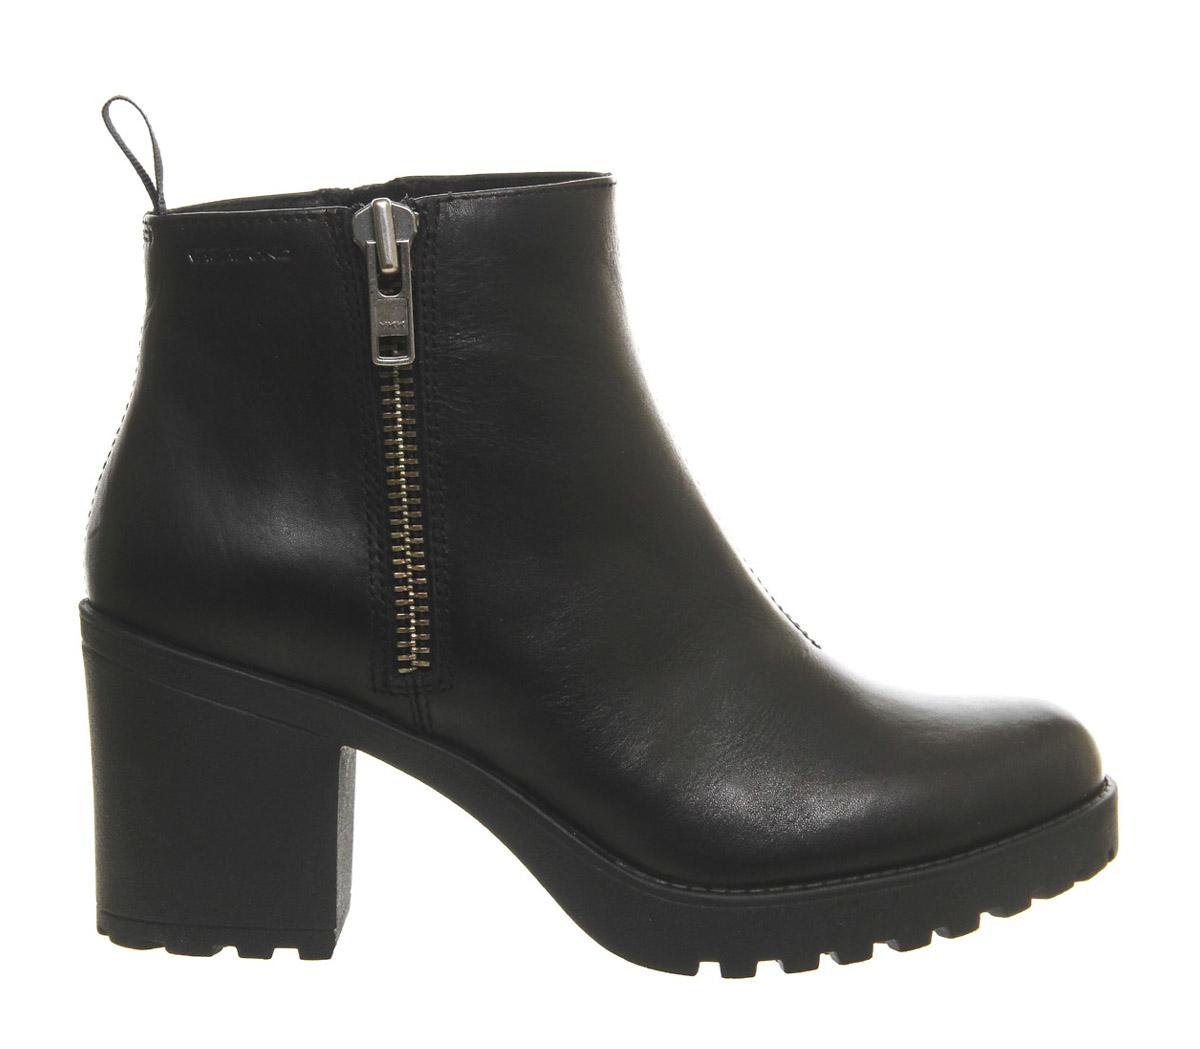 Vagabond Grace Side Zip Boots In Black